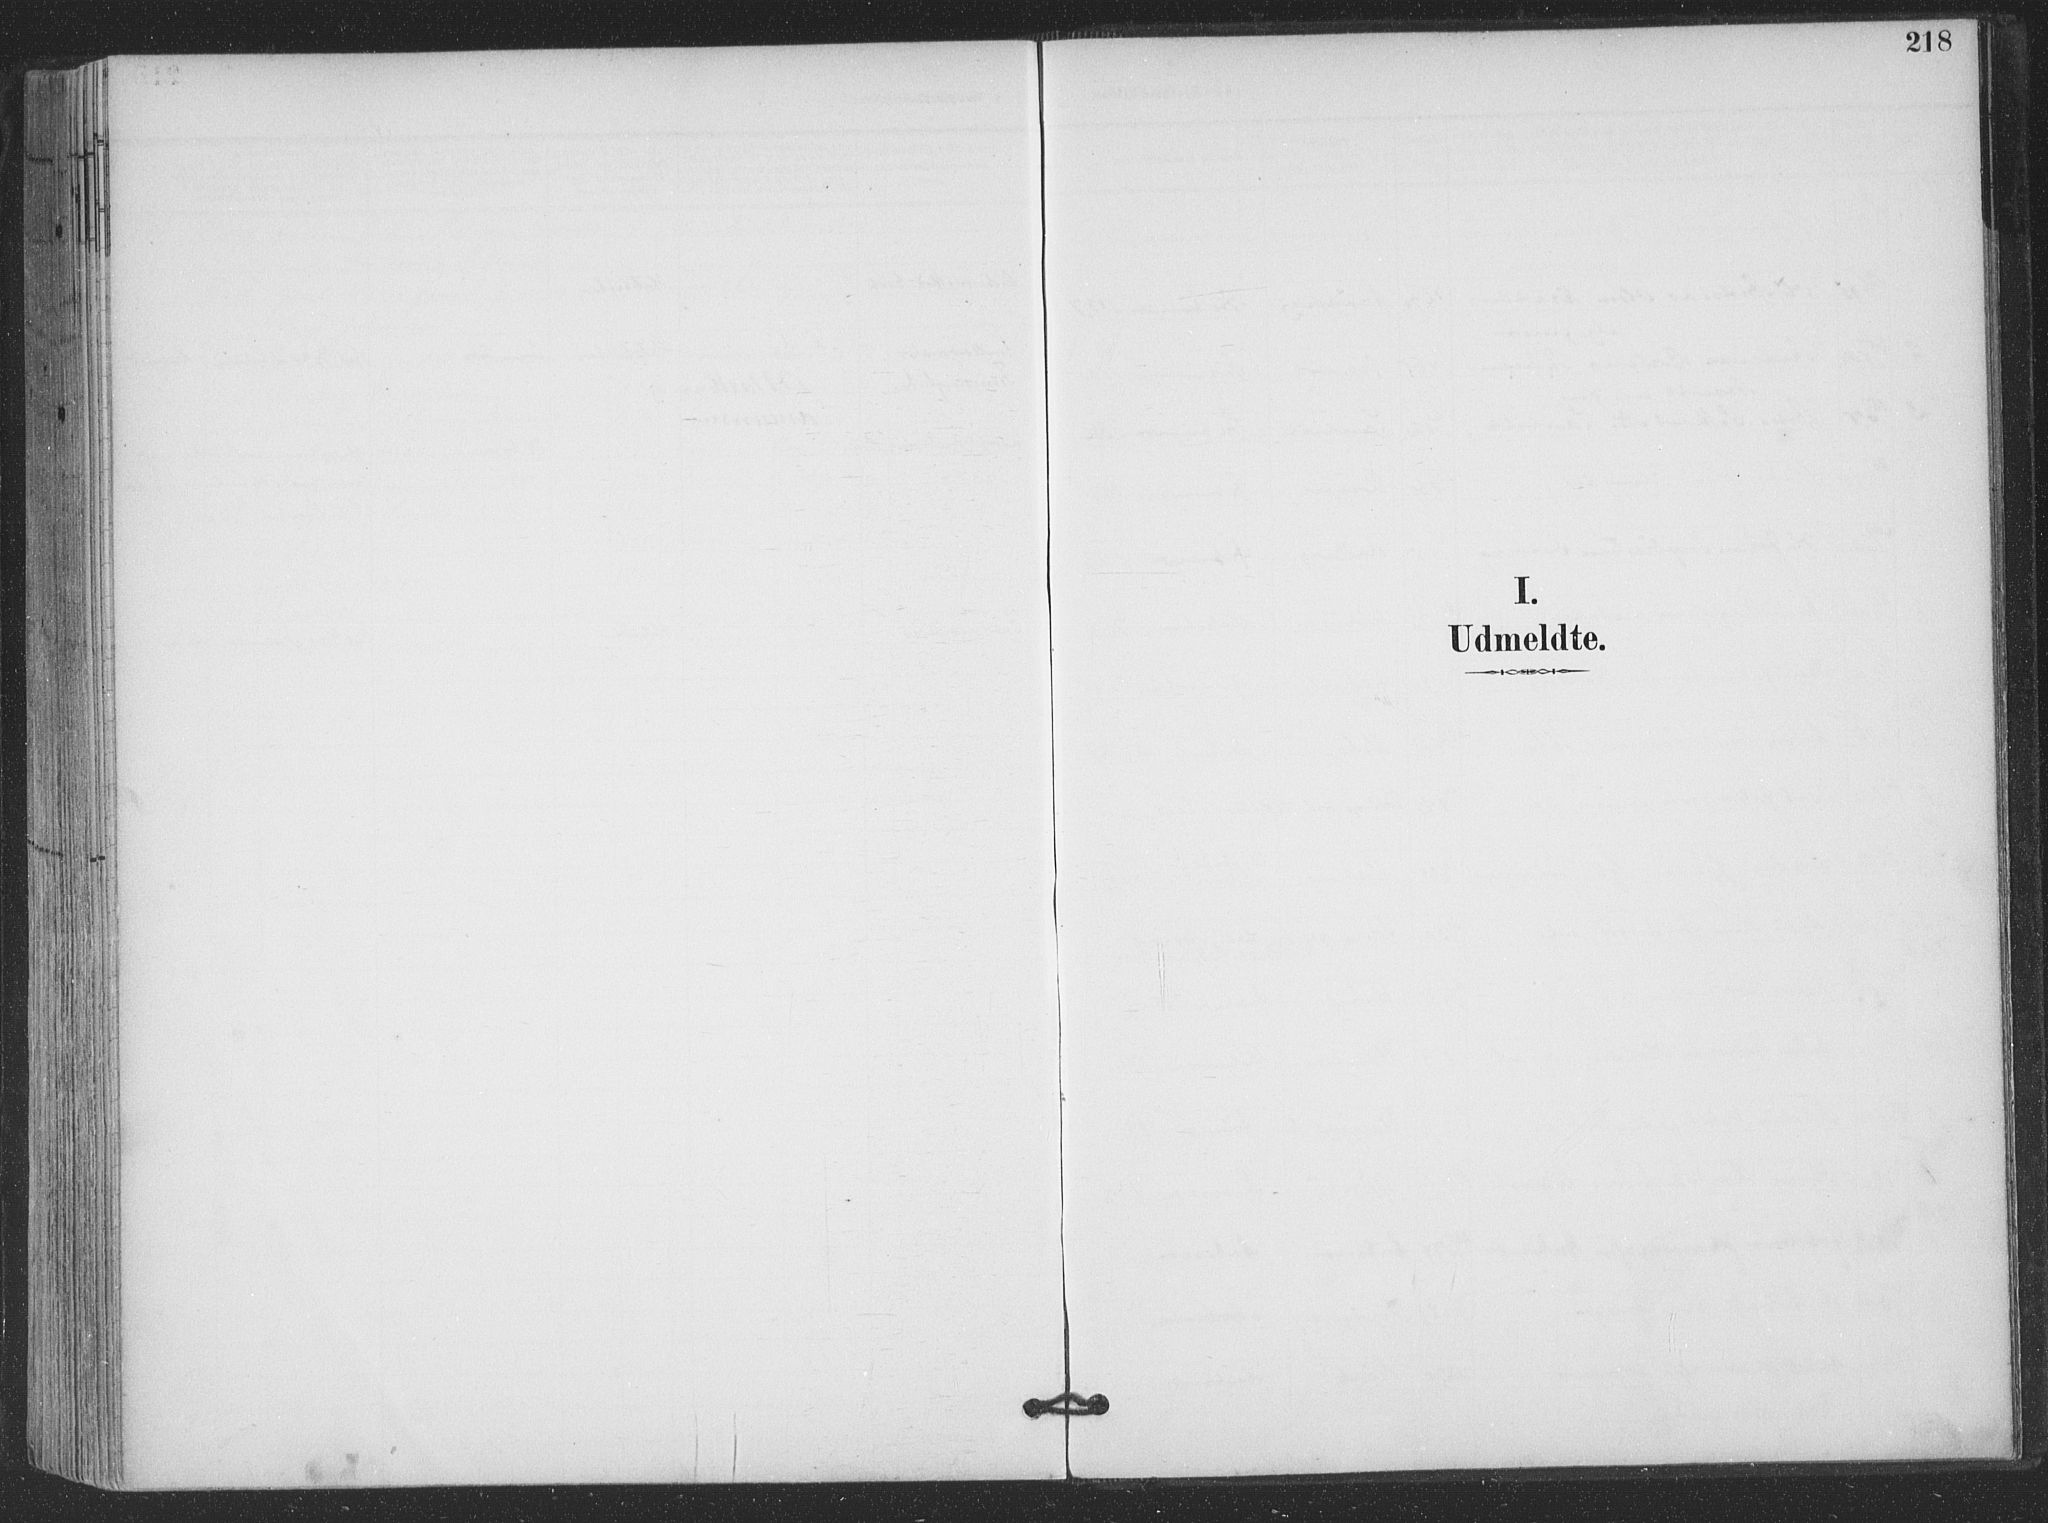 SAT, Ministerialprotokoller, klokkerbøker og fødselsregistre - Nordland, 866/L0939: Ministerialbok nr. 866A02, 1894-1906, s. 218